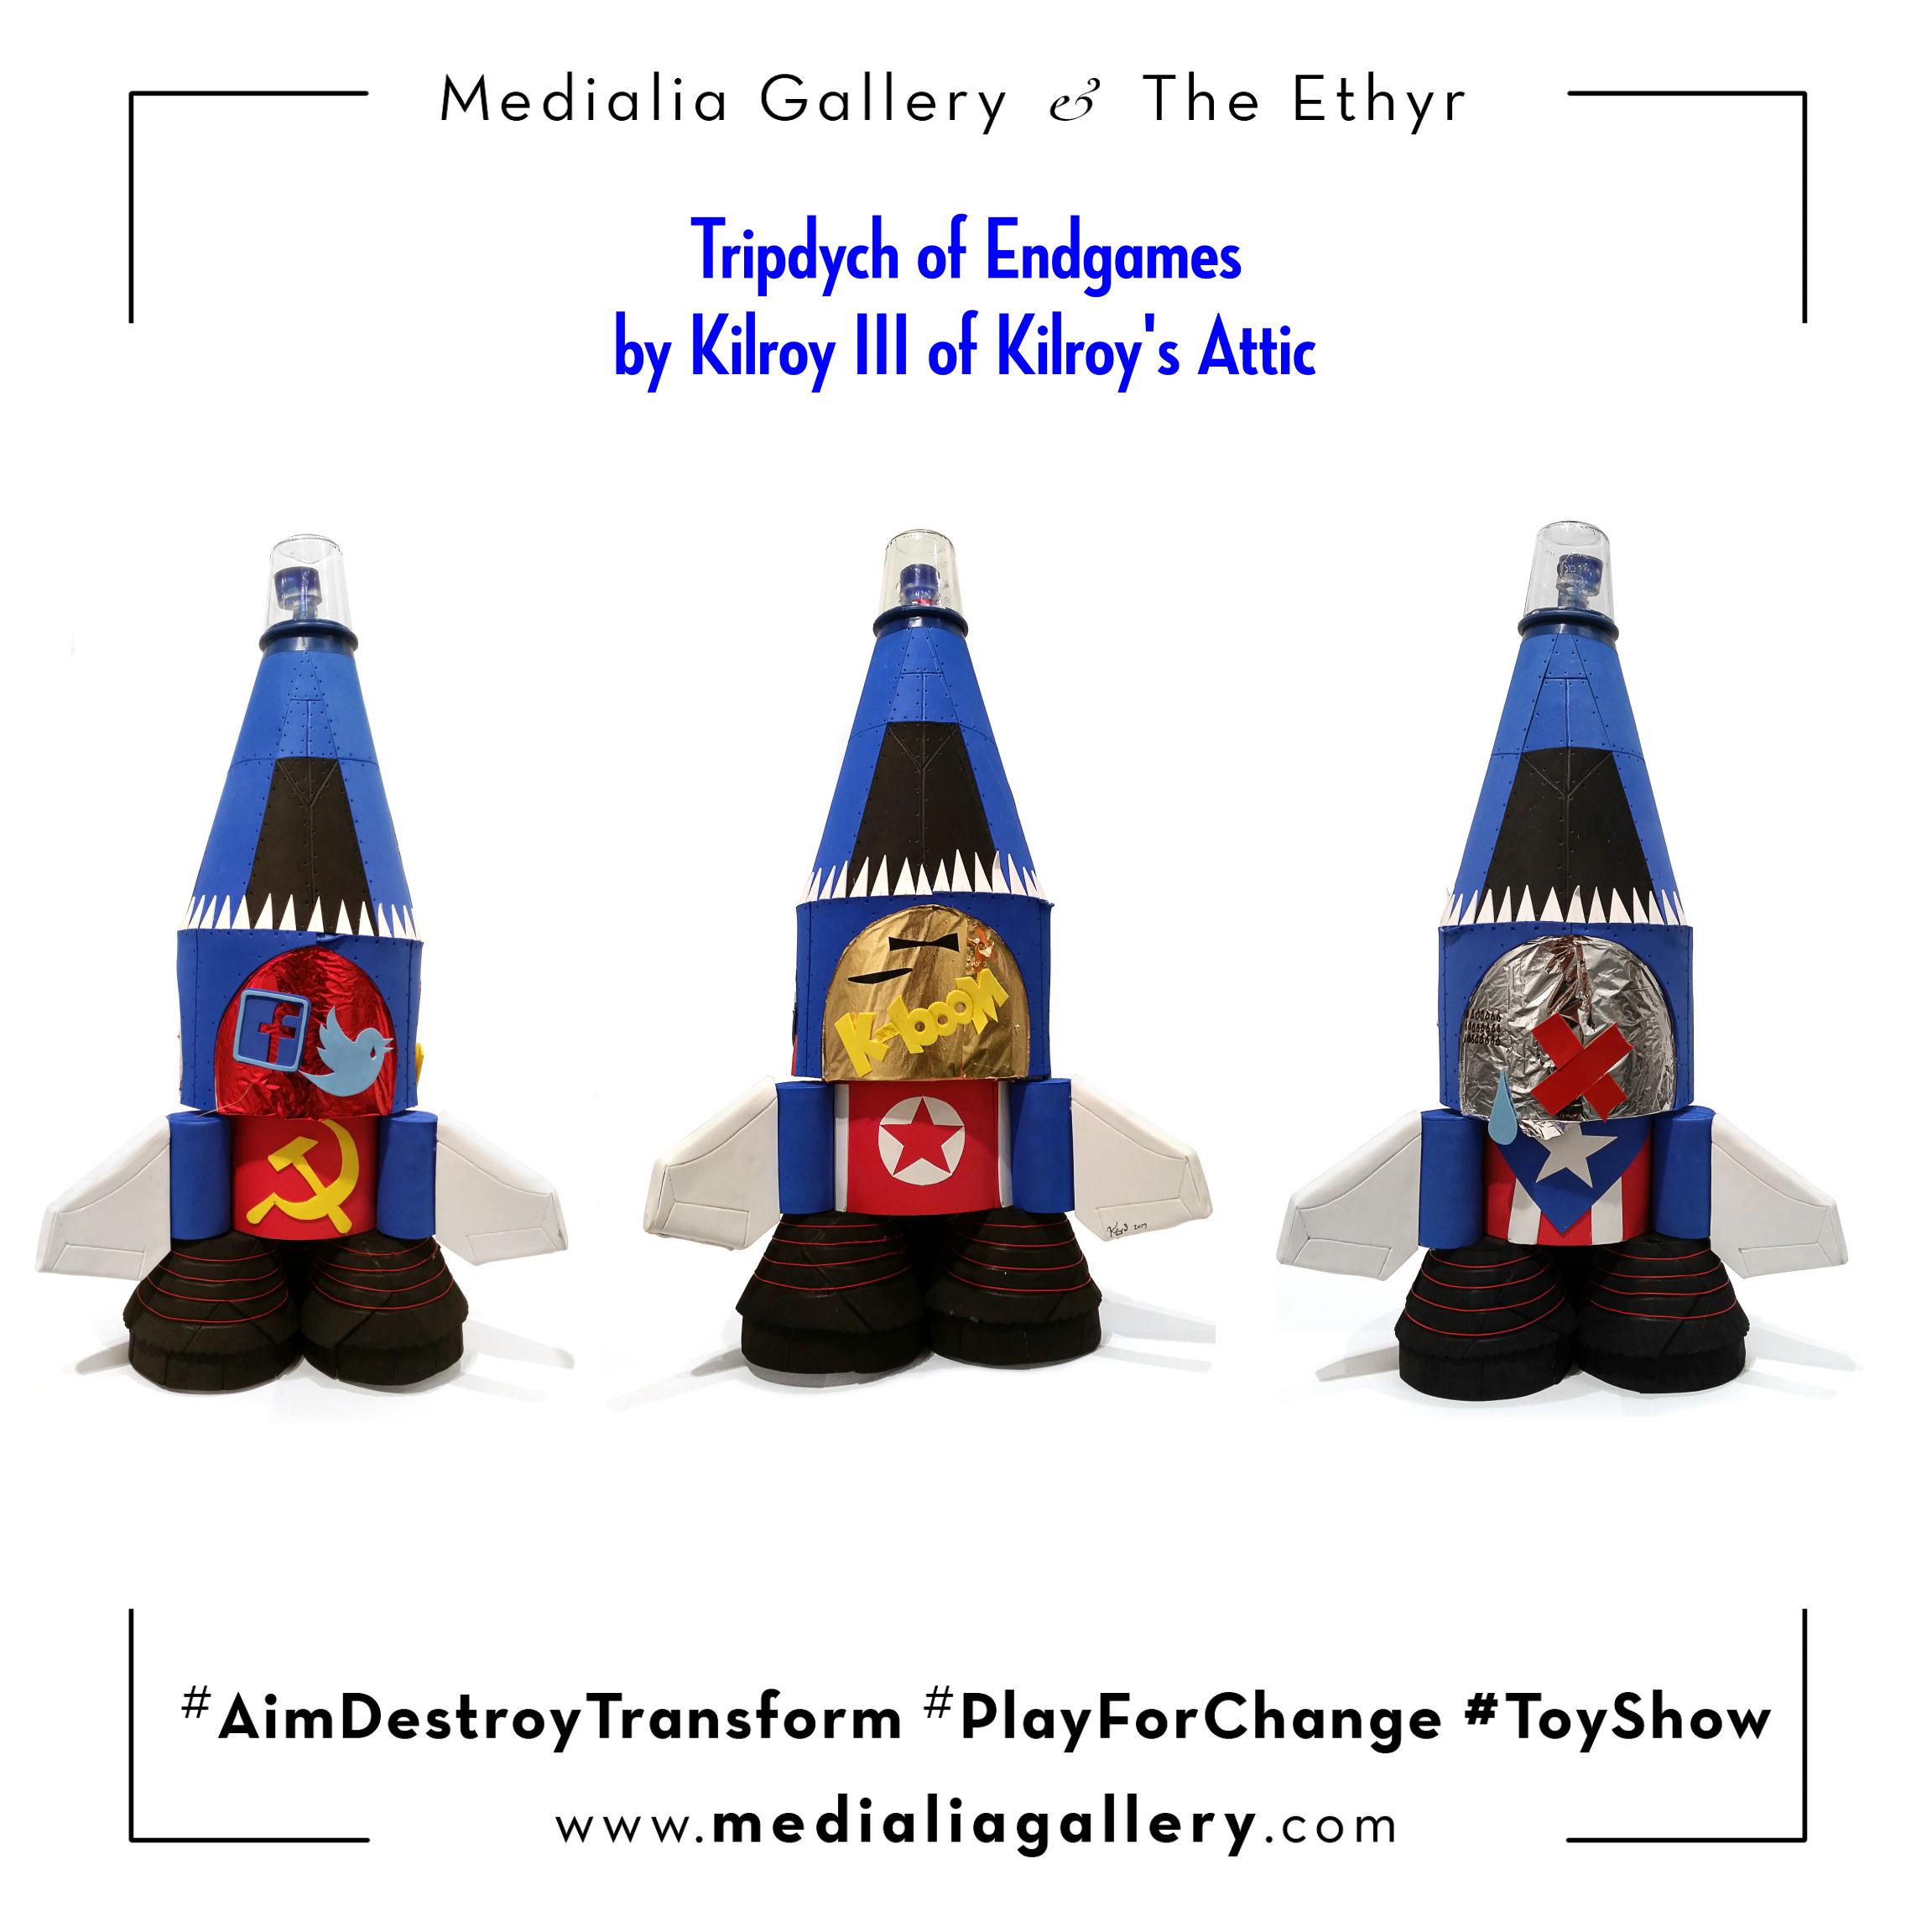 MedialiaGallery_The_Ethyr_AimDestroyTransform_Toy_Tripdych_of_Endgames_Kilroy_III_KilroysAttic_II_November_2017.png